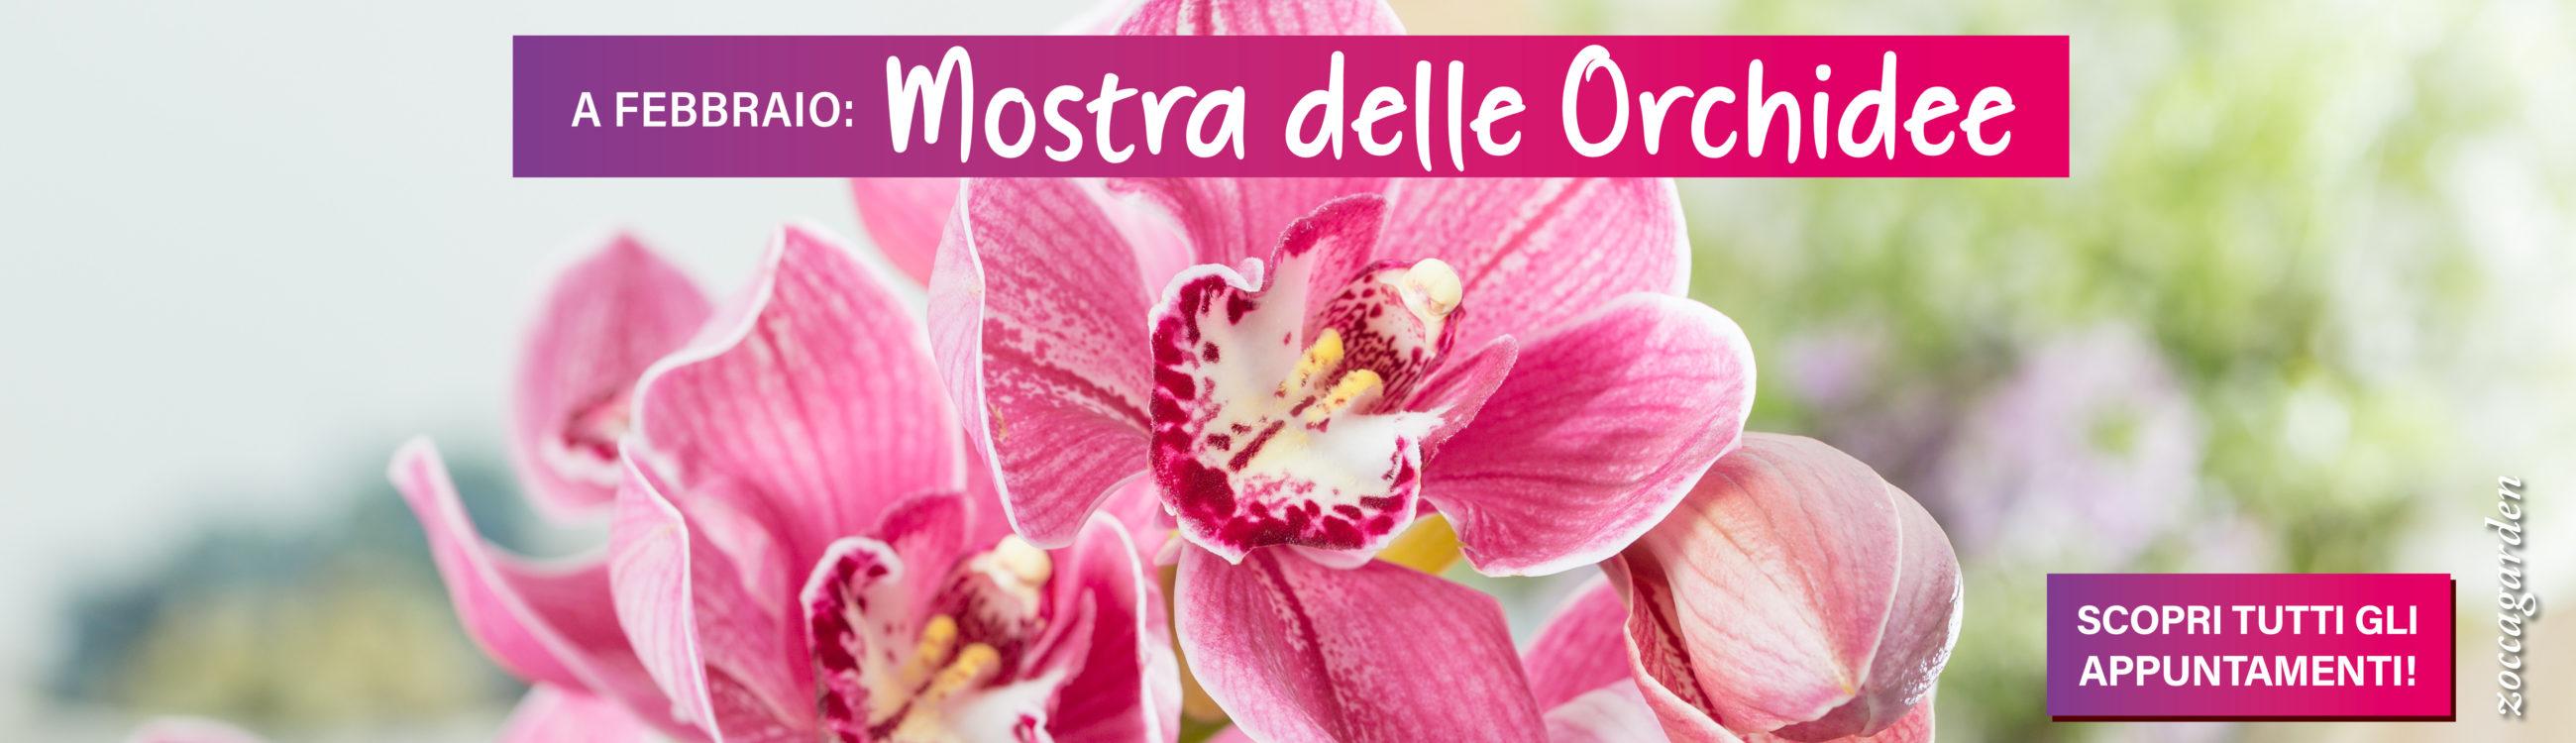 Slider Mostra delle Orchidee